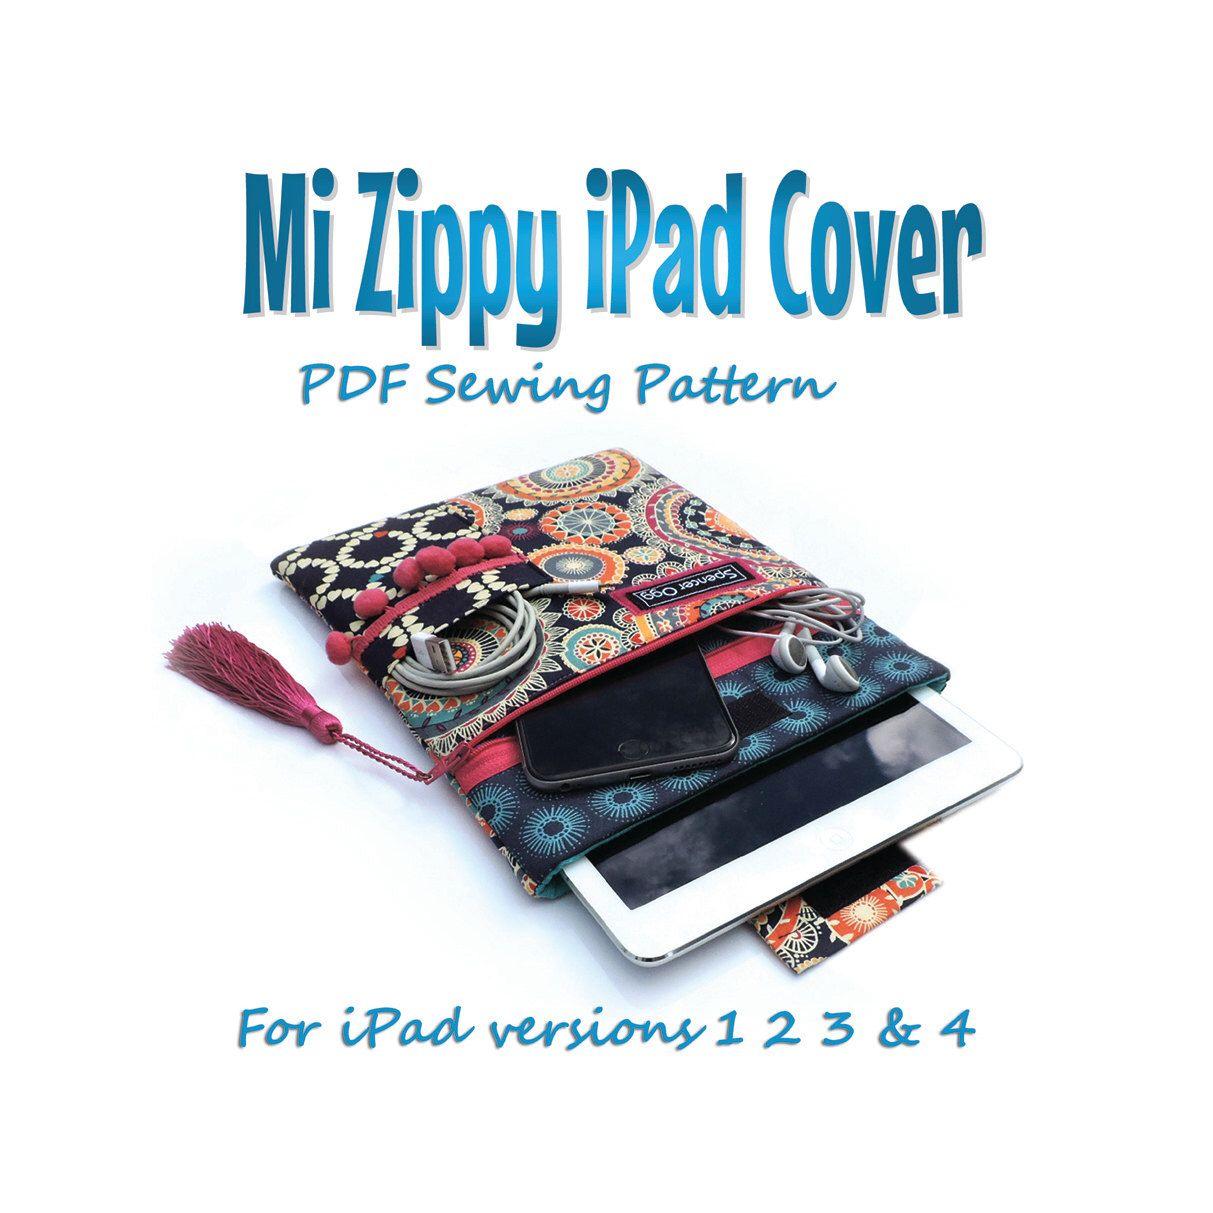 iPad cover PDF pattern. Mi Zippy iPad cover. For iPads 1 2